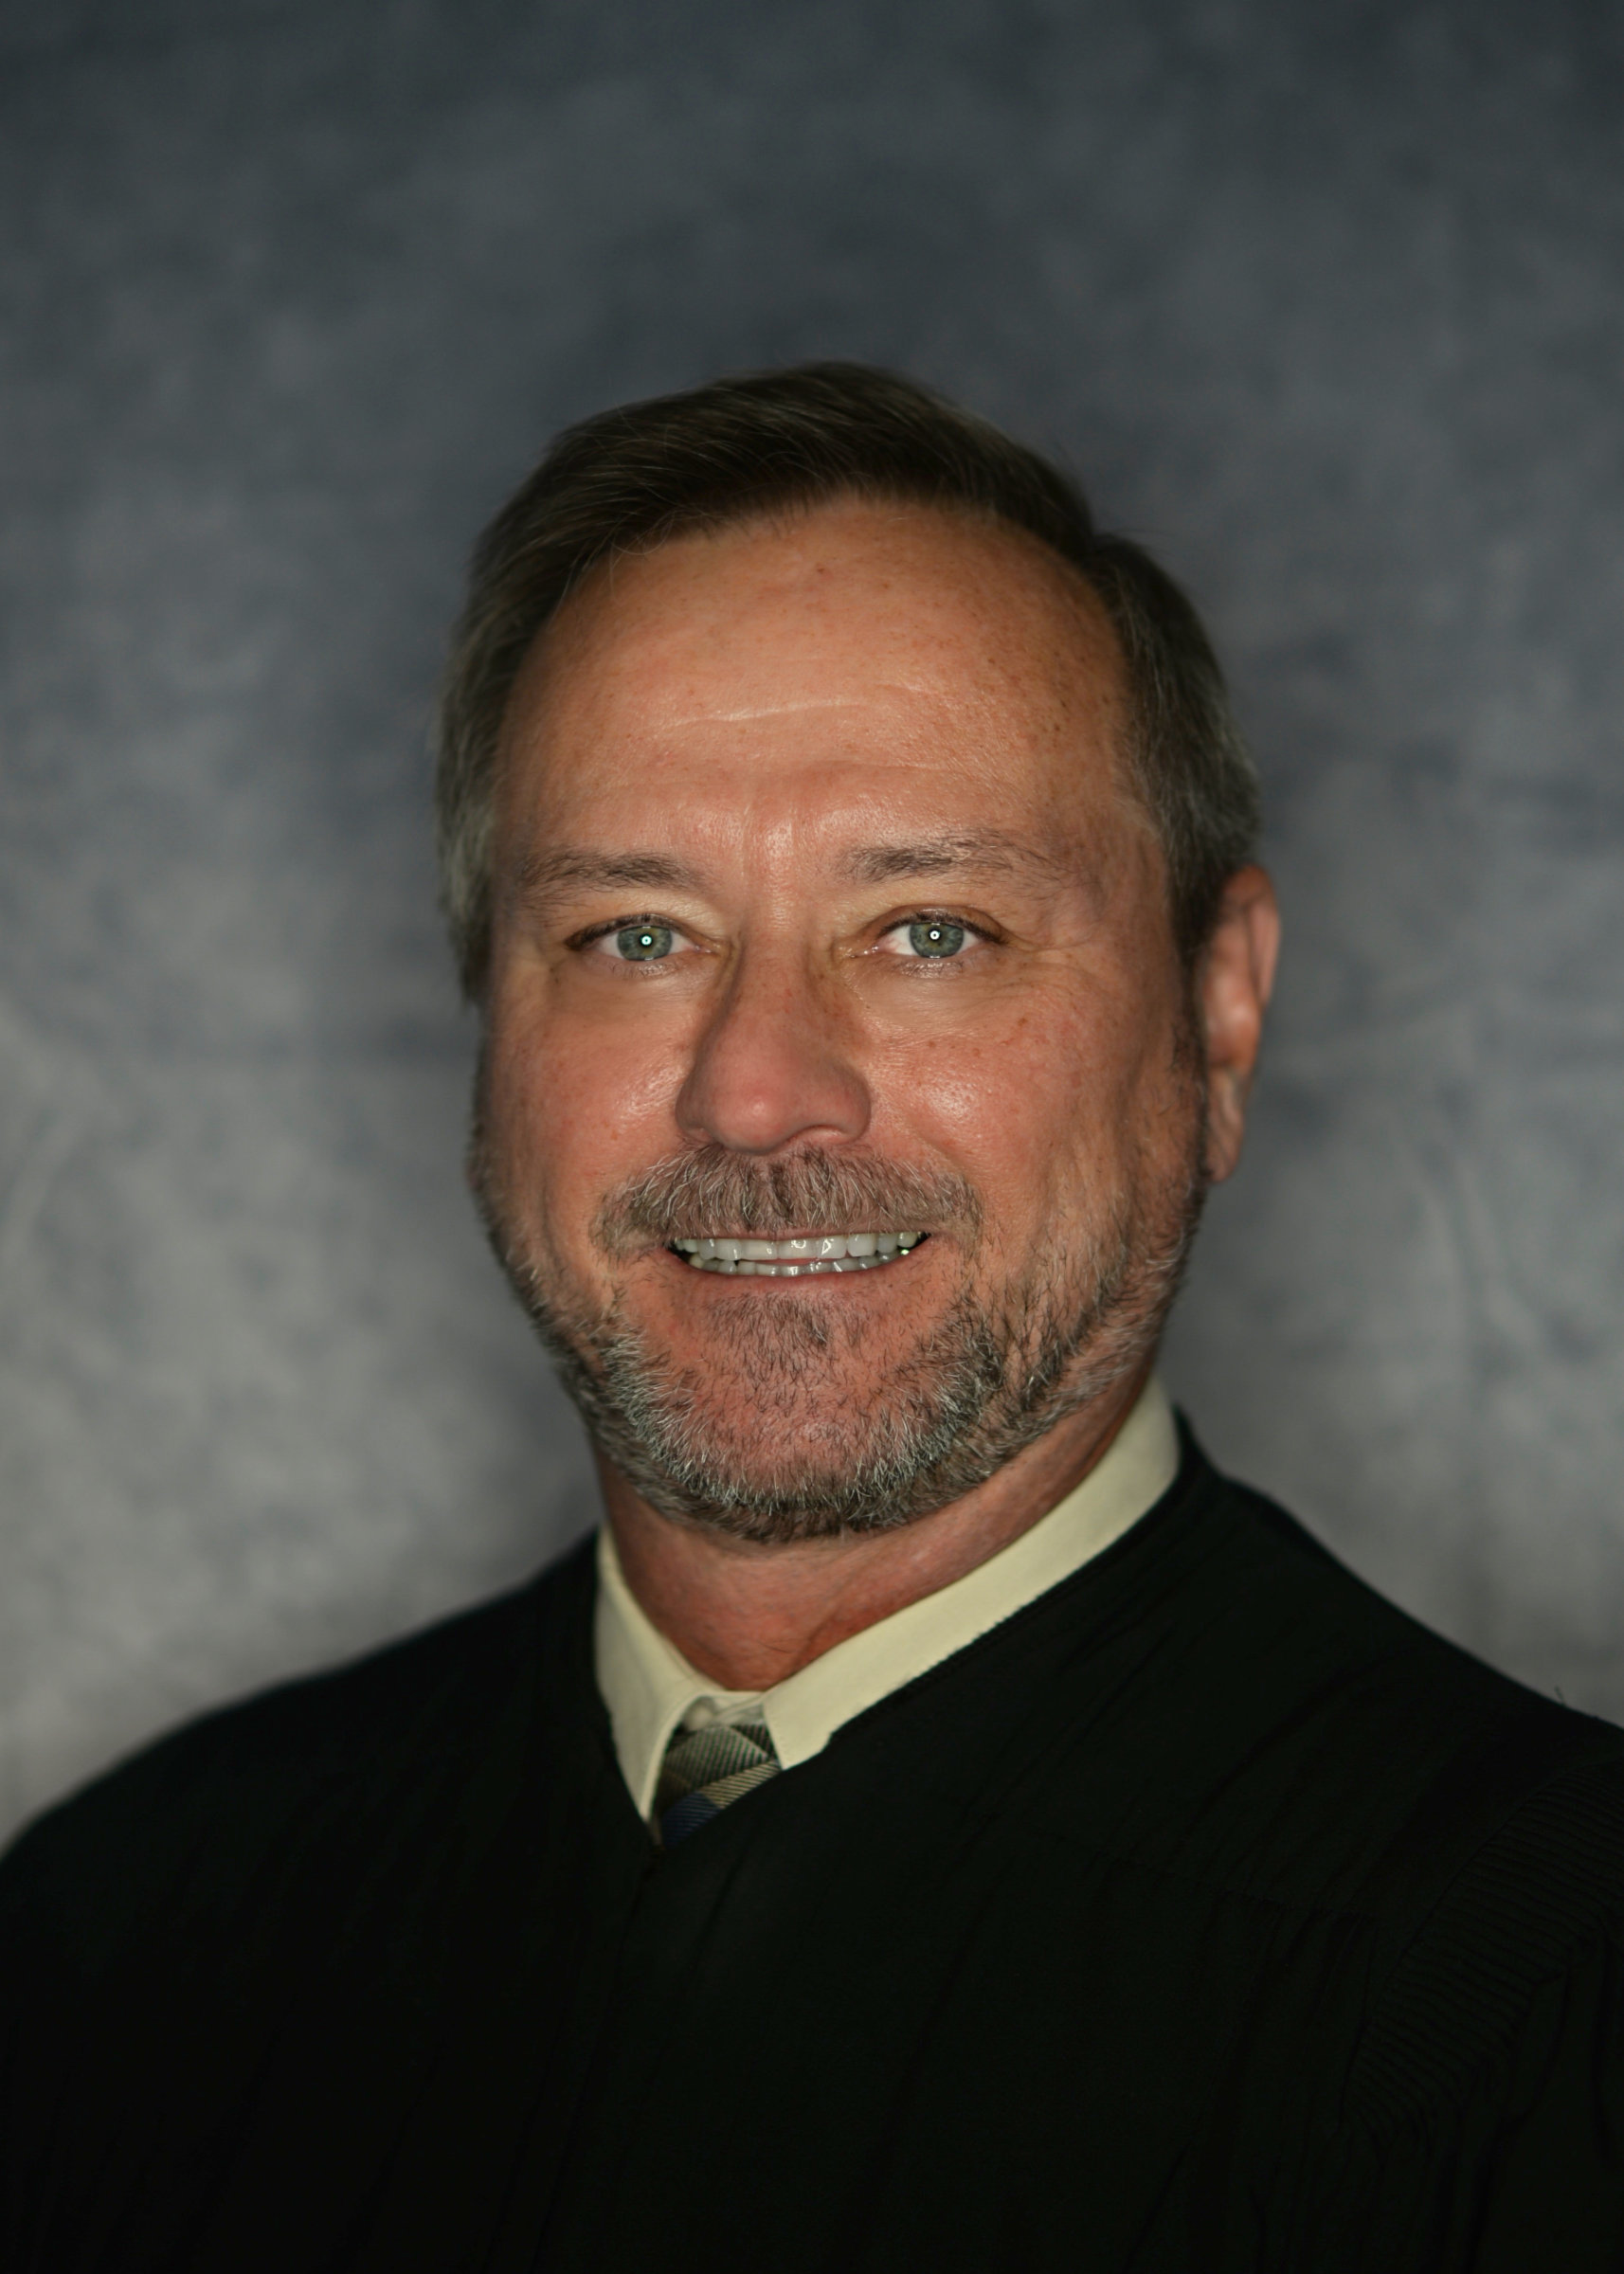 Judge Jaworski